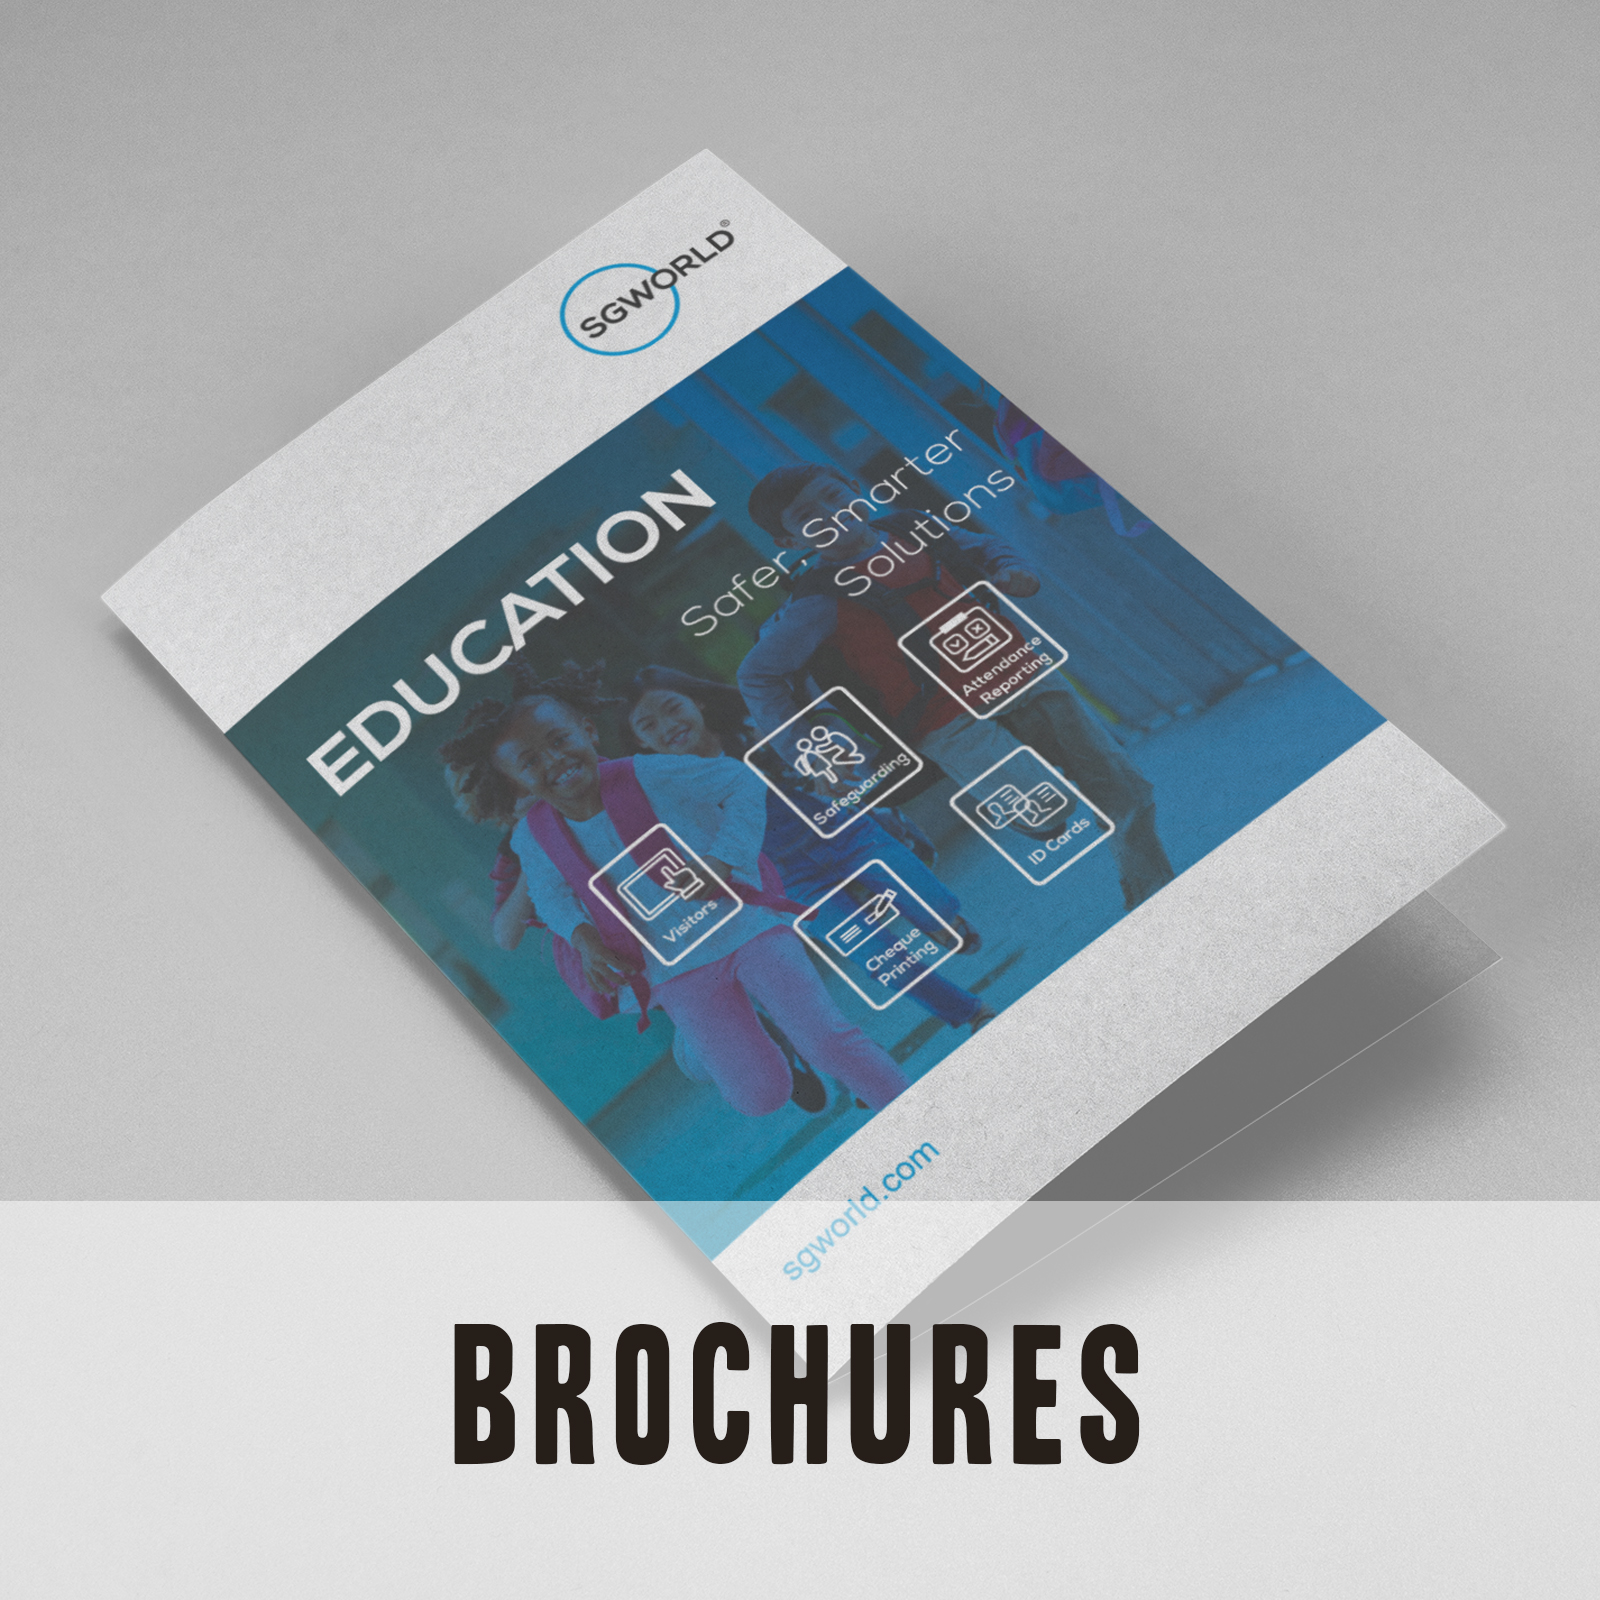 Brochures - SG World  Education Brochure